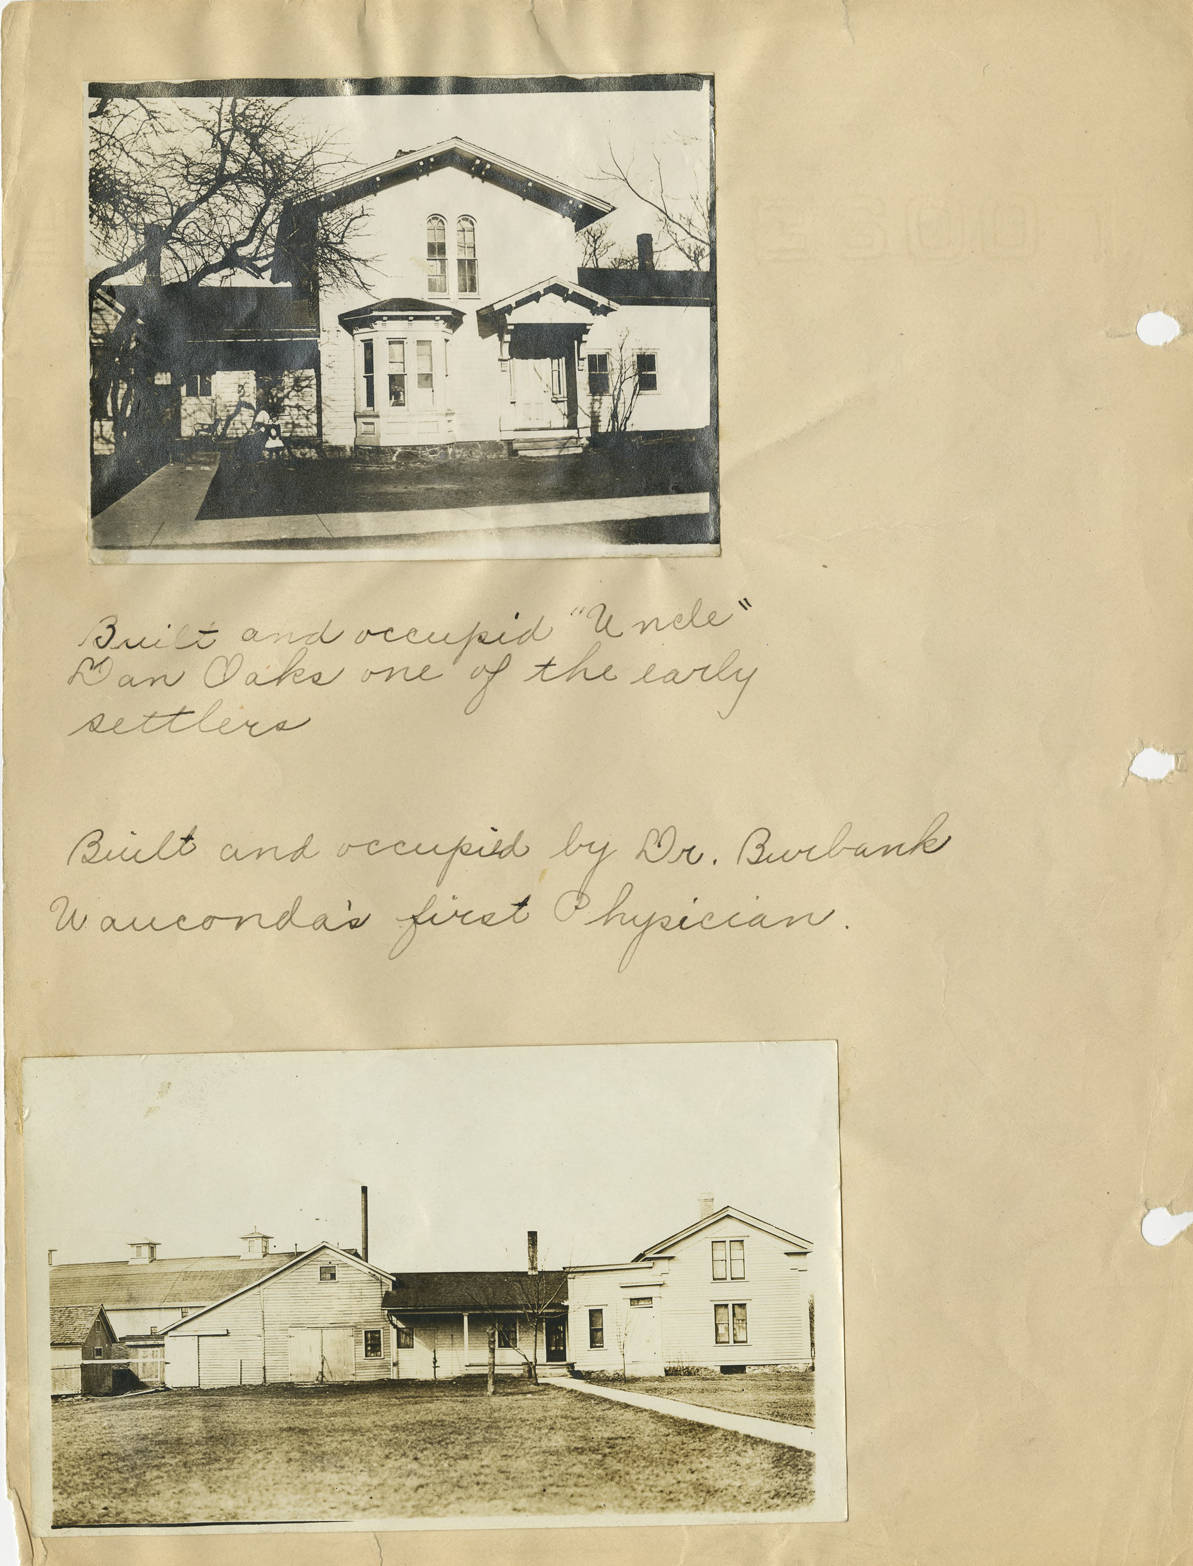 C:\Users\Vern\Documents\Fort Hill\1918 Schools Centennial\1918 Wauconda Twp Wauconda School\1918_School_Histories__Wauconda_Township__Wauconda_School_2003046_Page_53.jpg